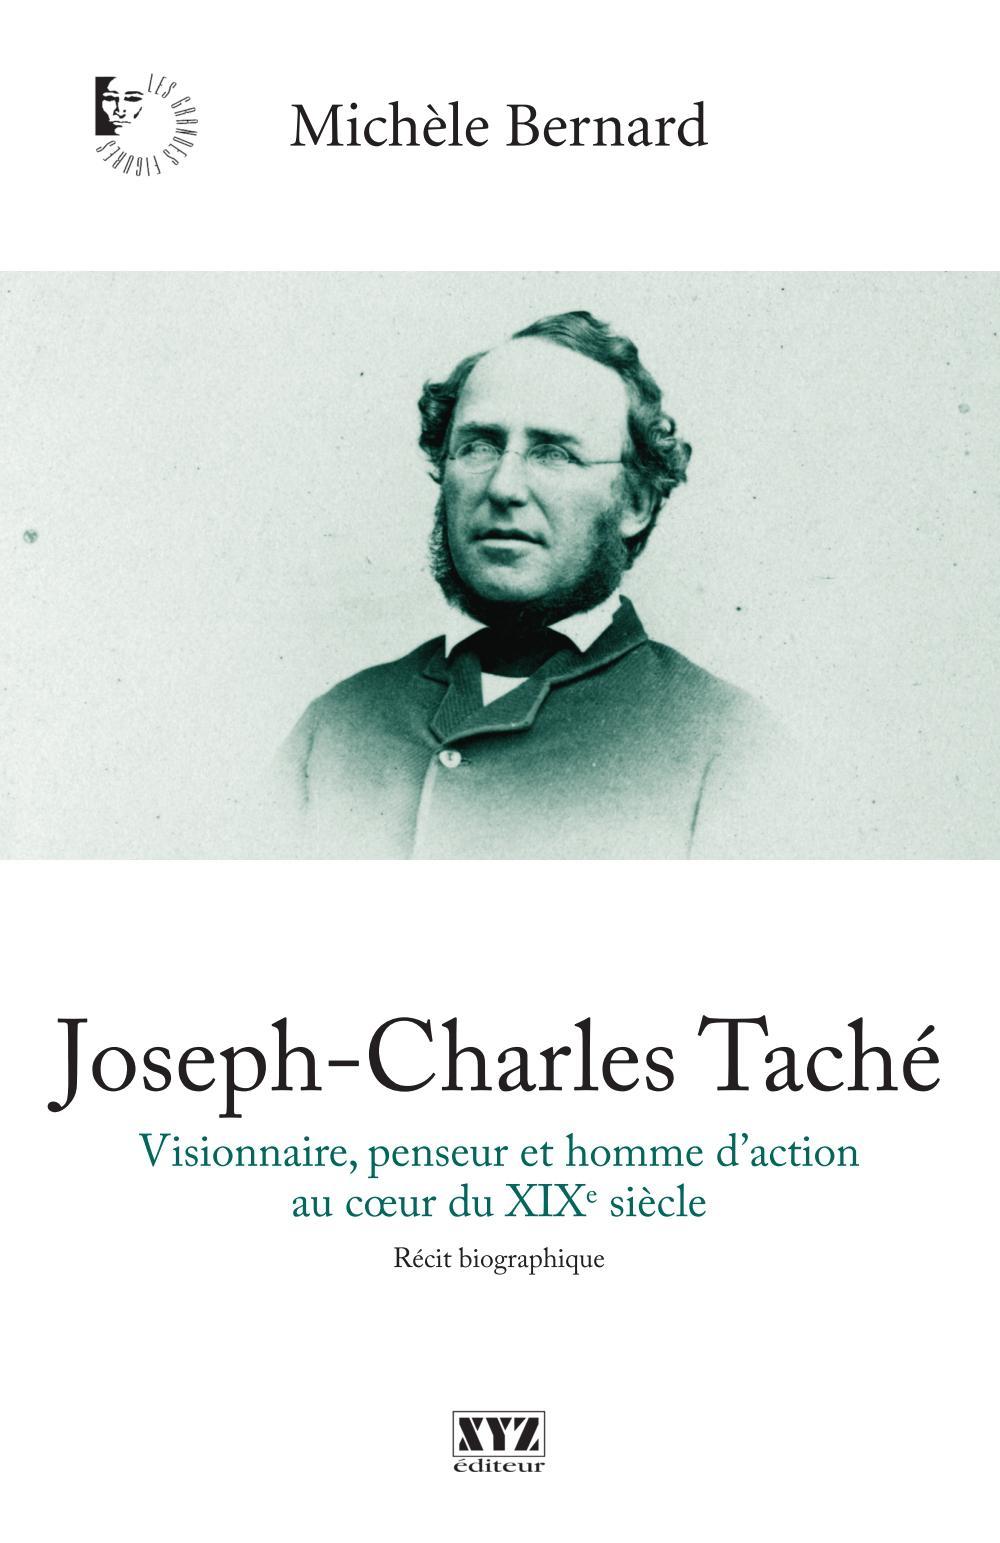 JOSEPH-CHARLES TACHE